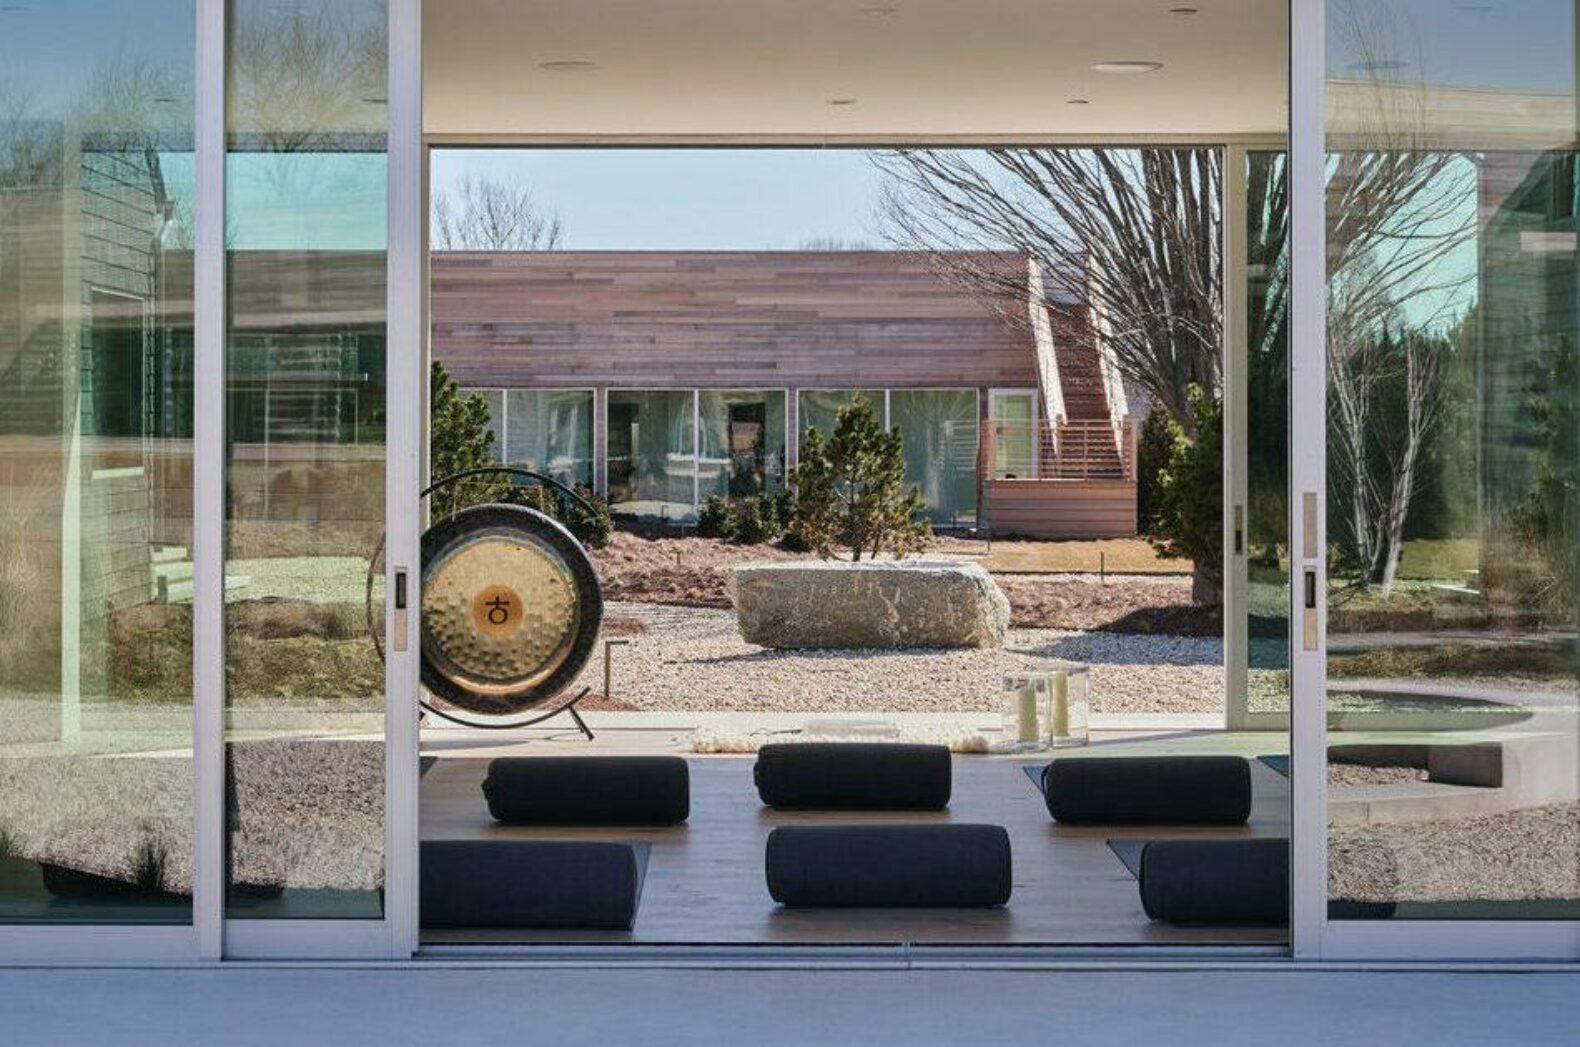 meditaiton-hall-nature-sound-healing-relax-experience-shou-sugi-ban-house-hamptons-new-york-usa